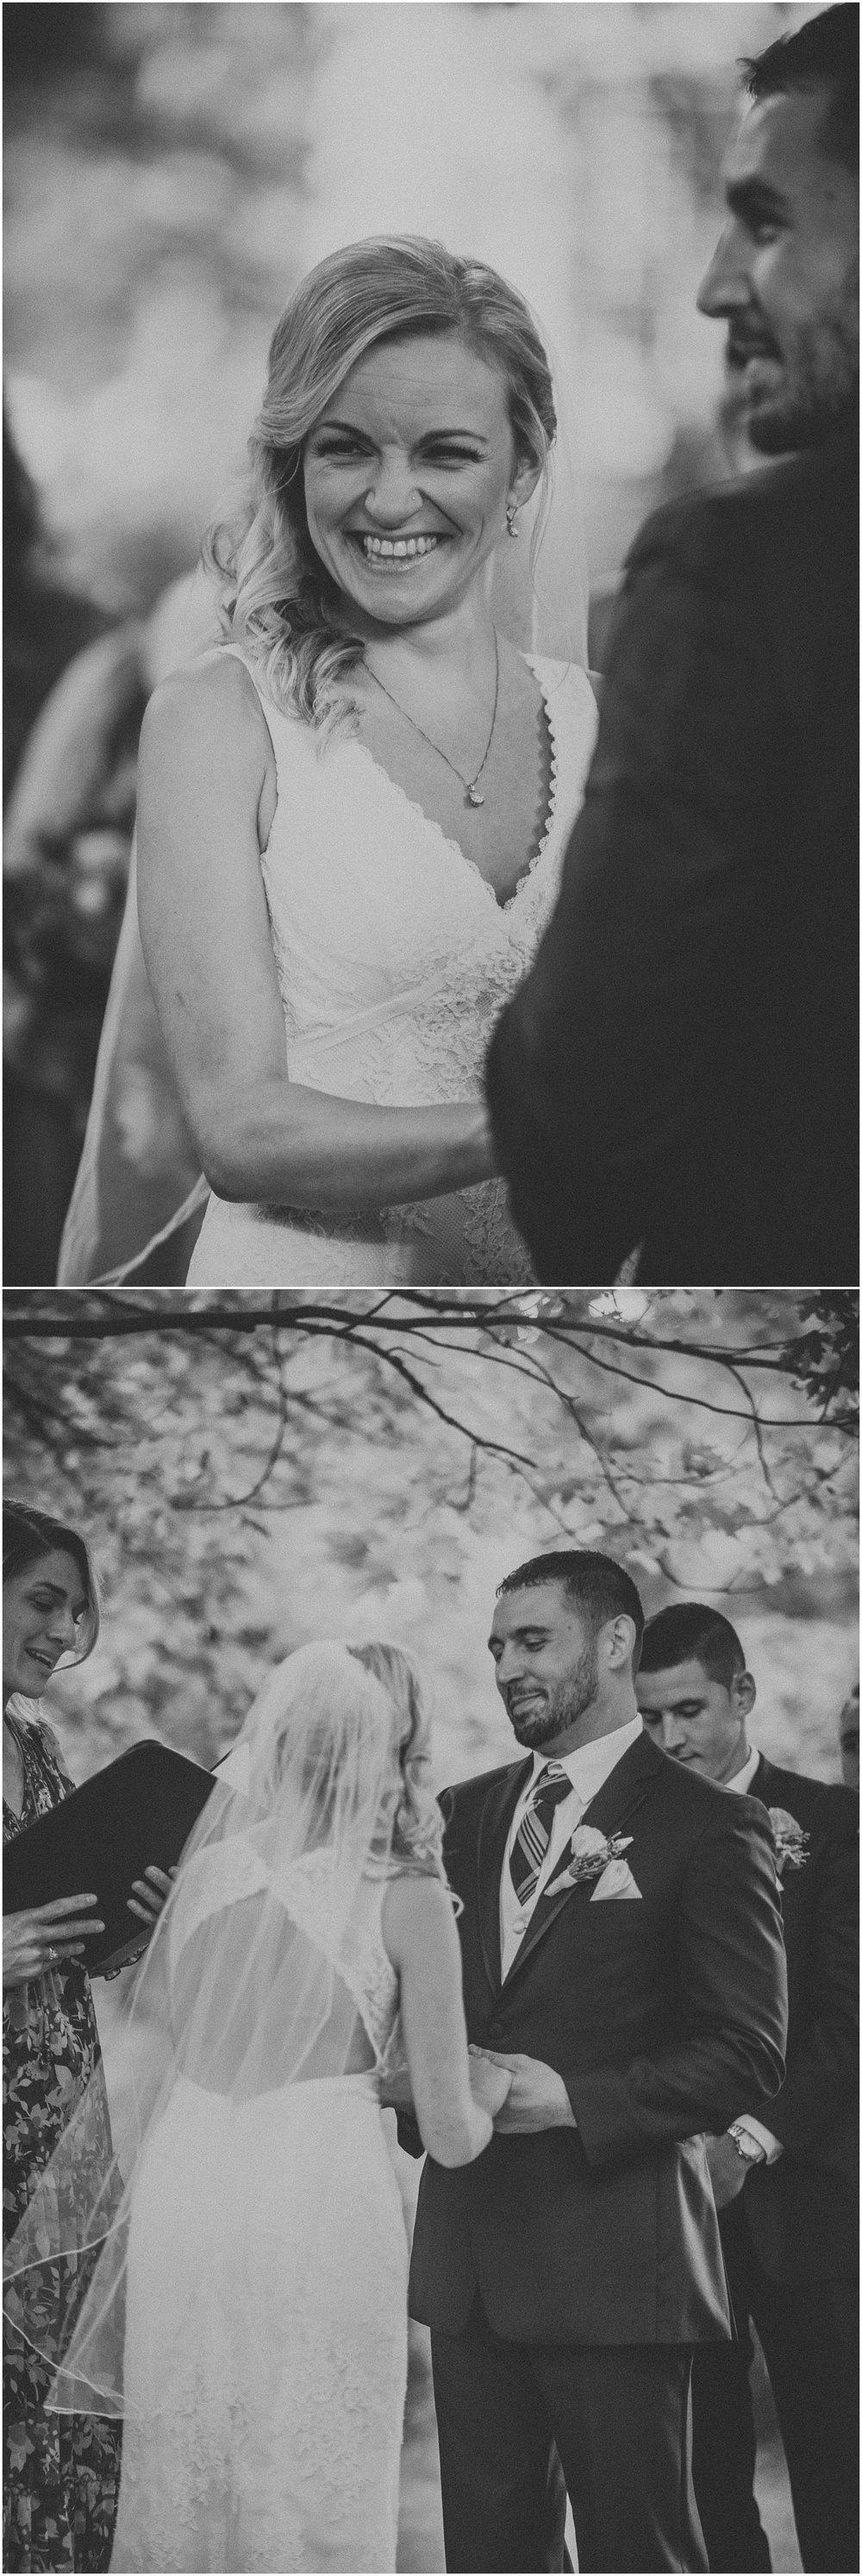 waterloo-village-waterloo village-wedding-outdoor wedding-rustic-boemian-new jersey-bride-groom-wedding party-davids bridal-wedding dress-wedding-first kiss-intimate wedding_0383.jpg